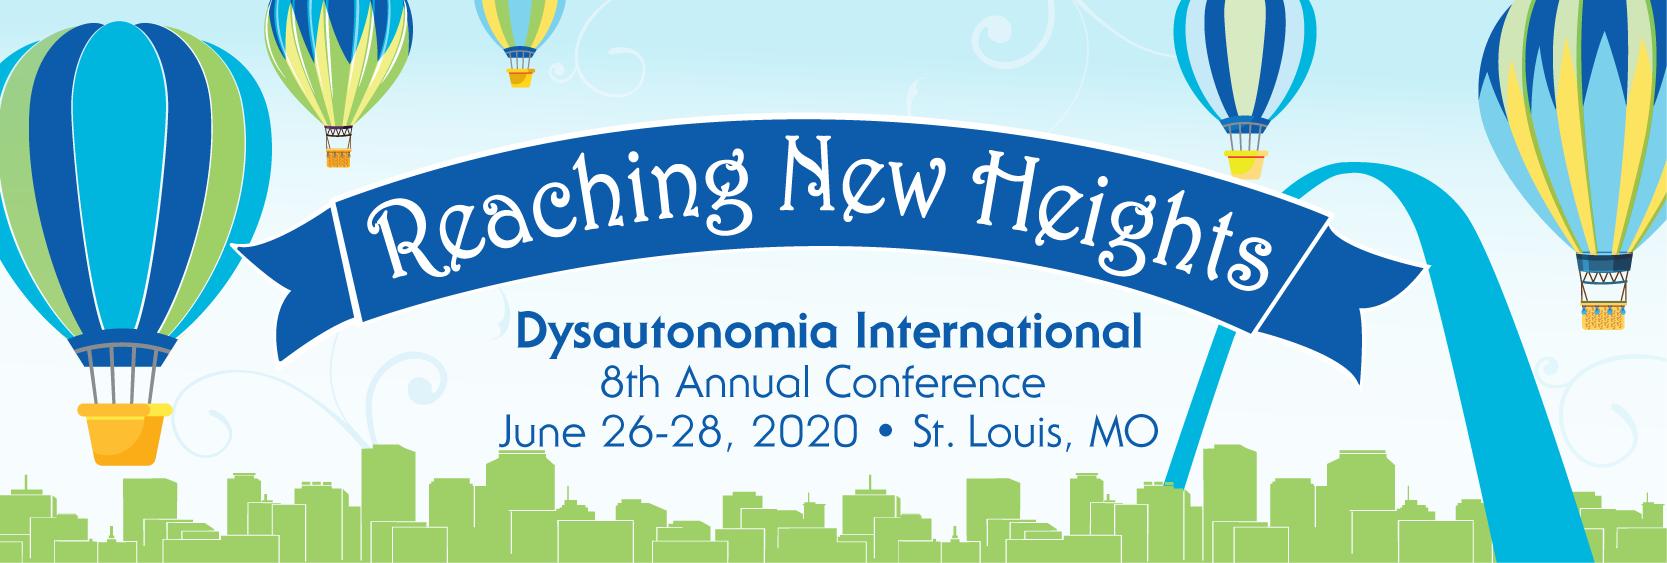 Dysautonomia International